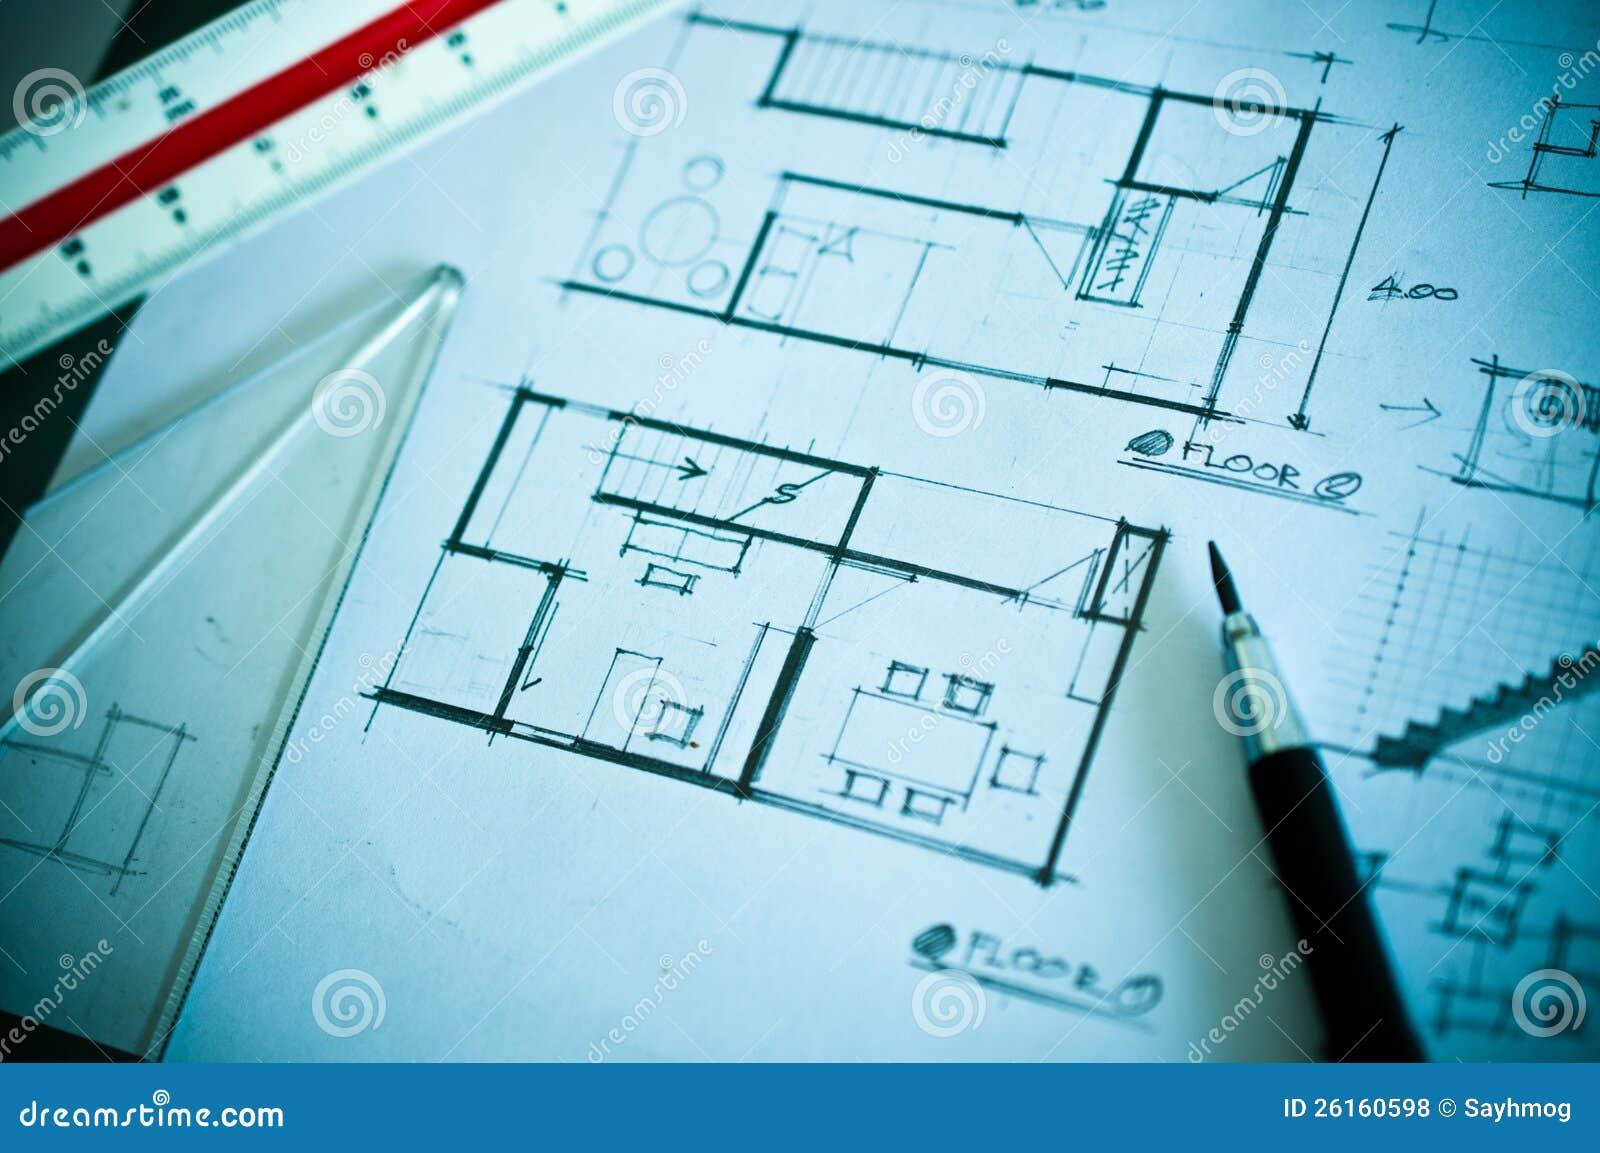 Work of interior design concept royalty free stock photos for Work for interior designer